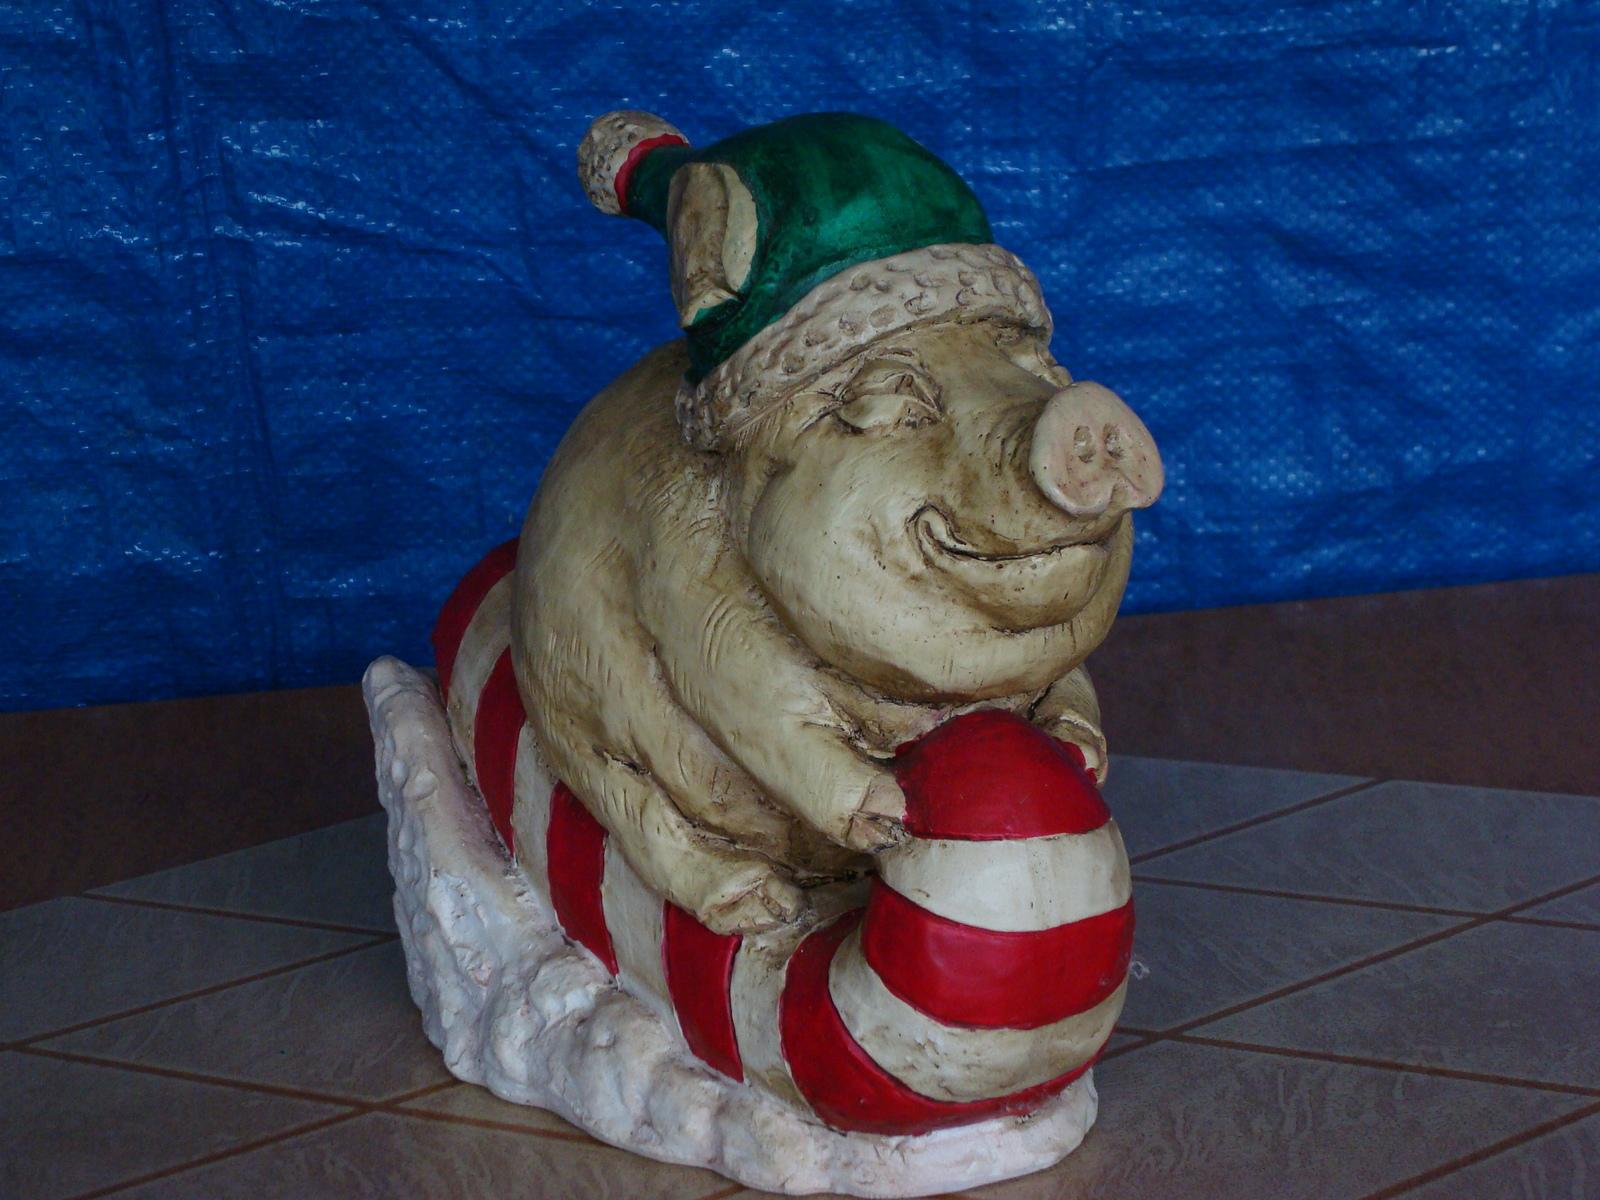 #0830 Piggy Sleigh Ride Statue